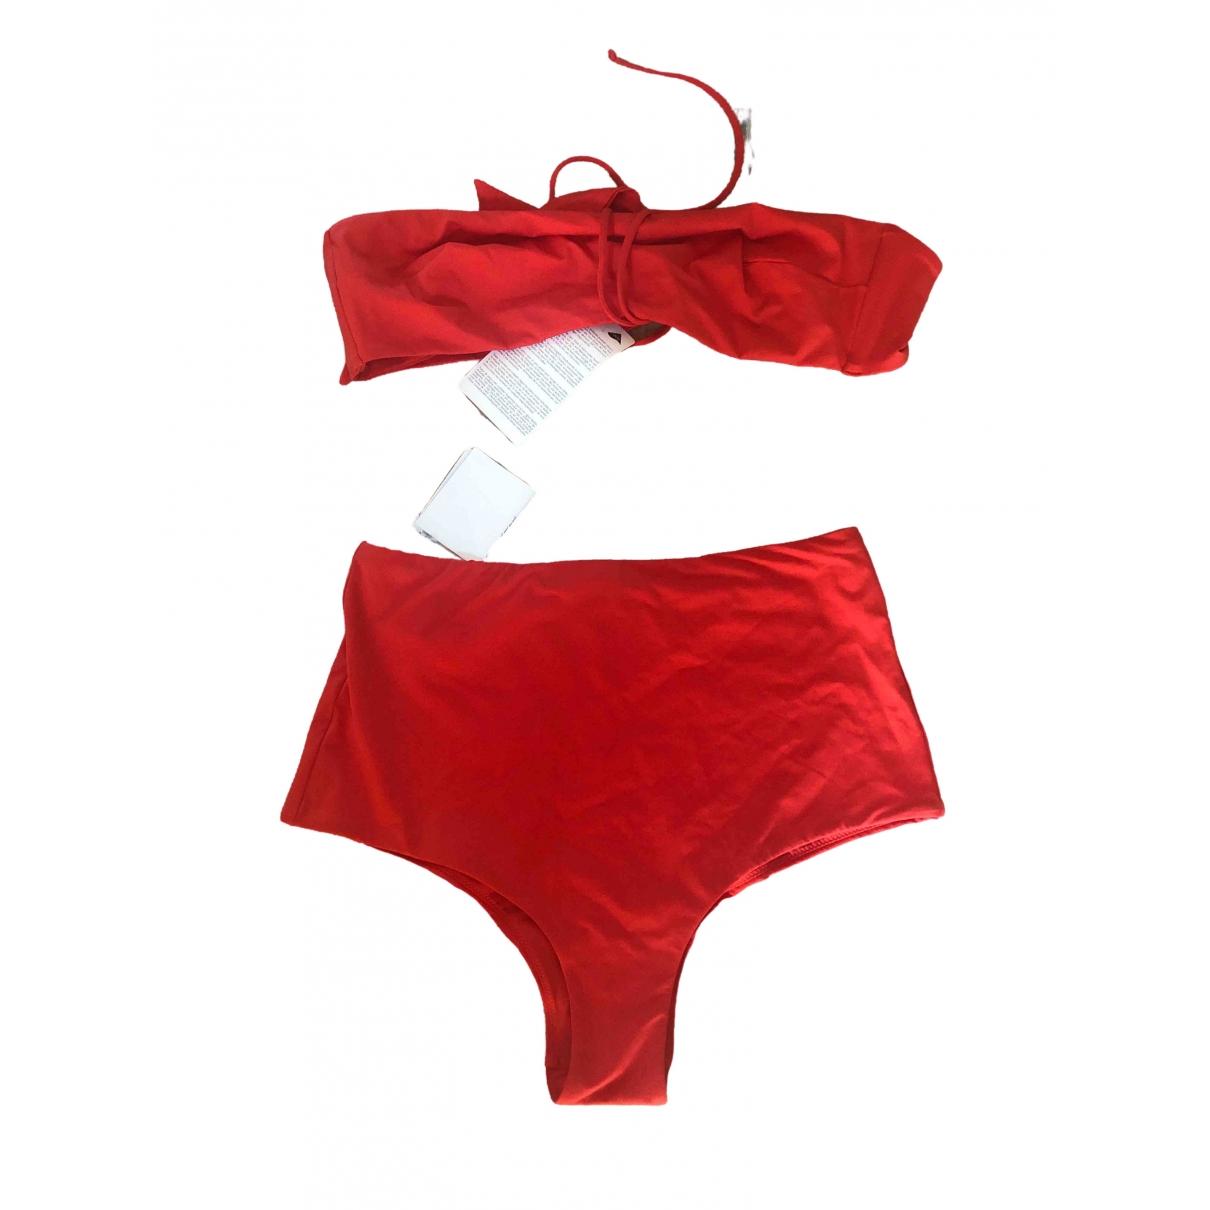 La Perla \N Badeanzug in  Rot Lycra